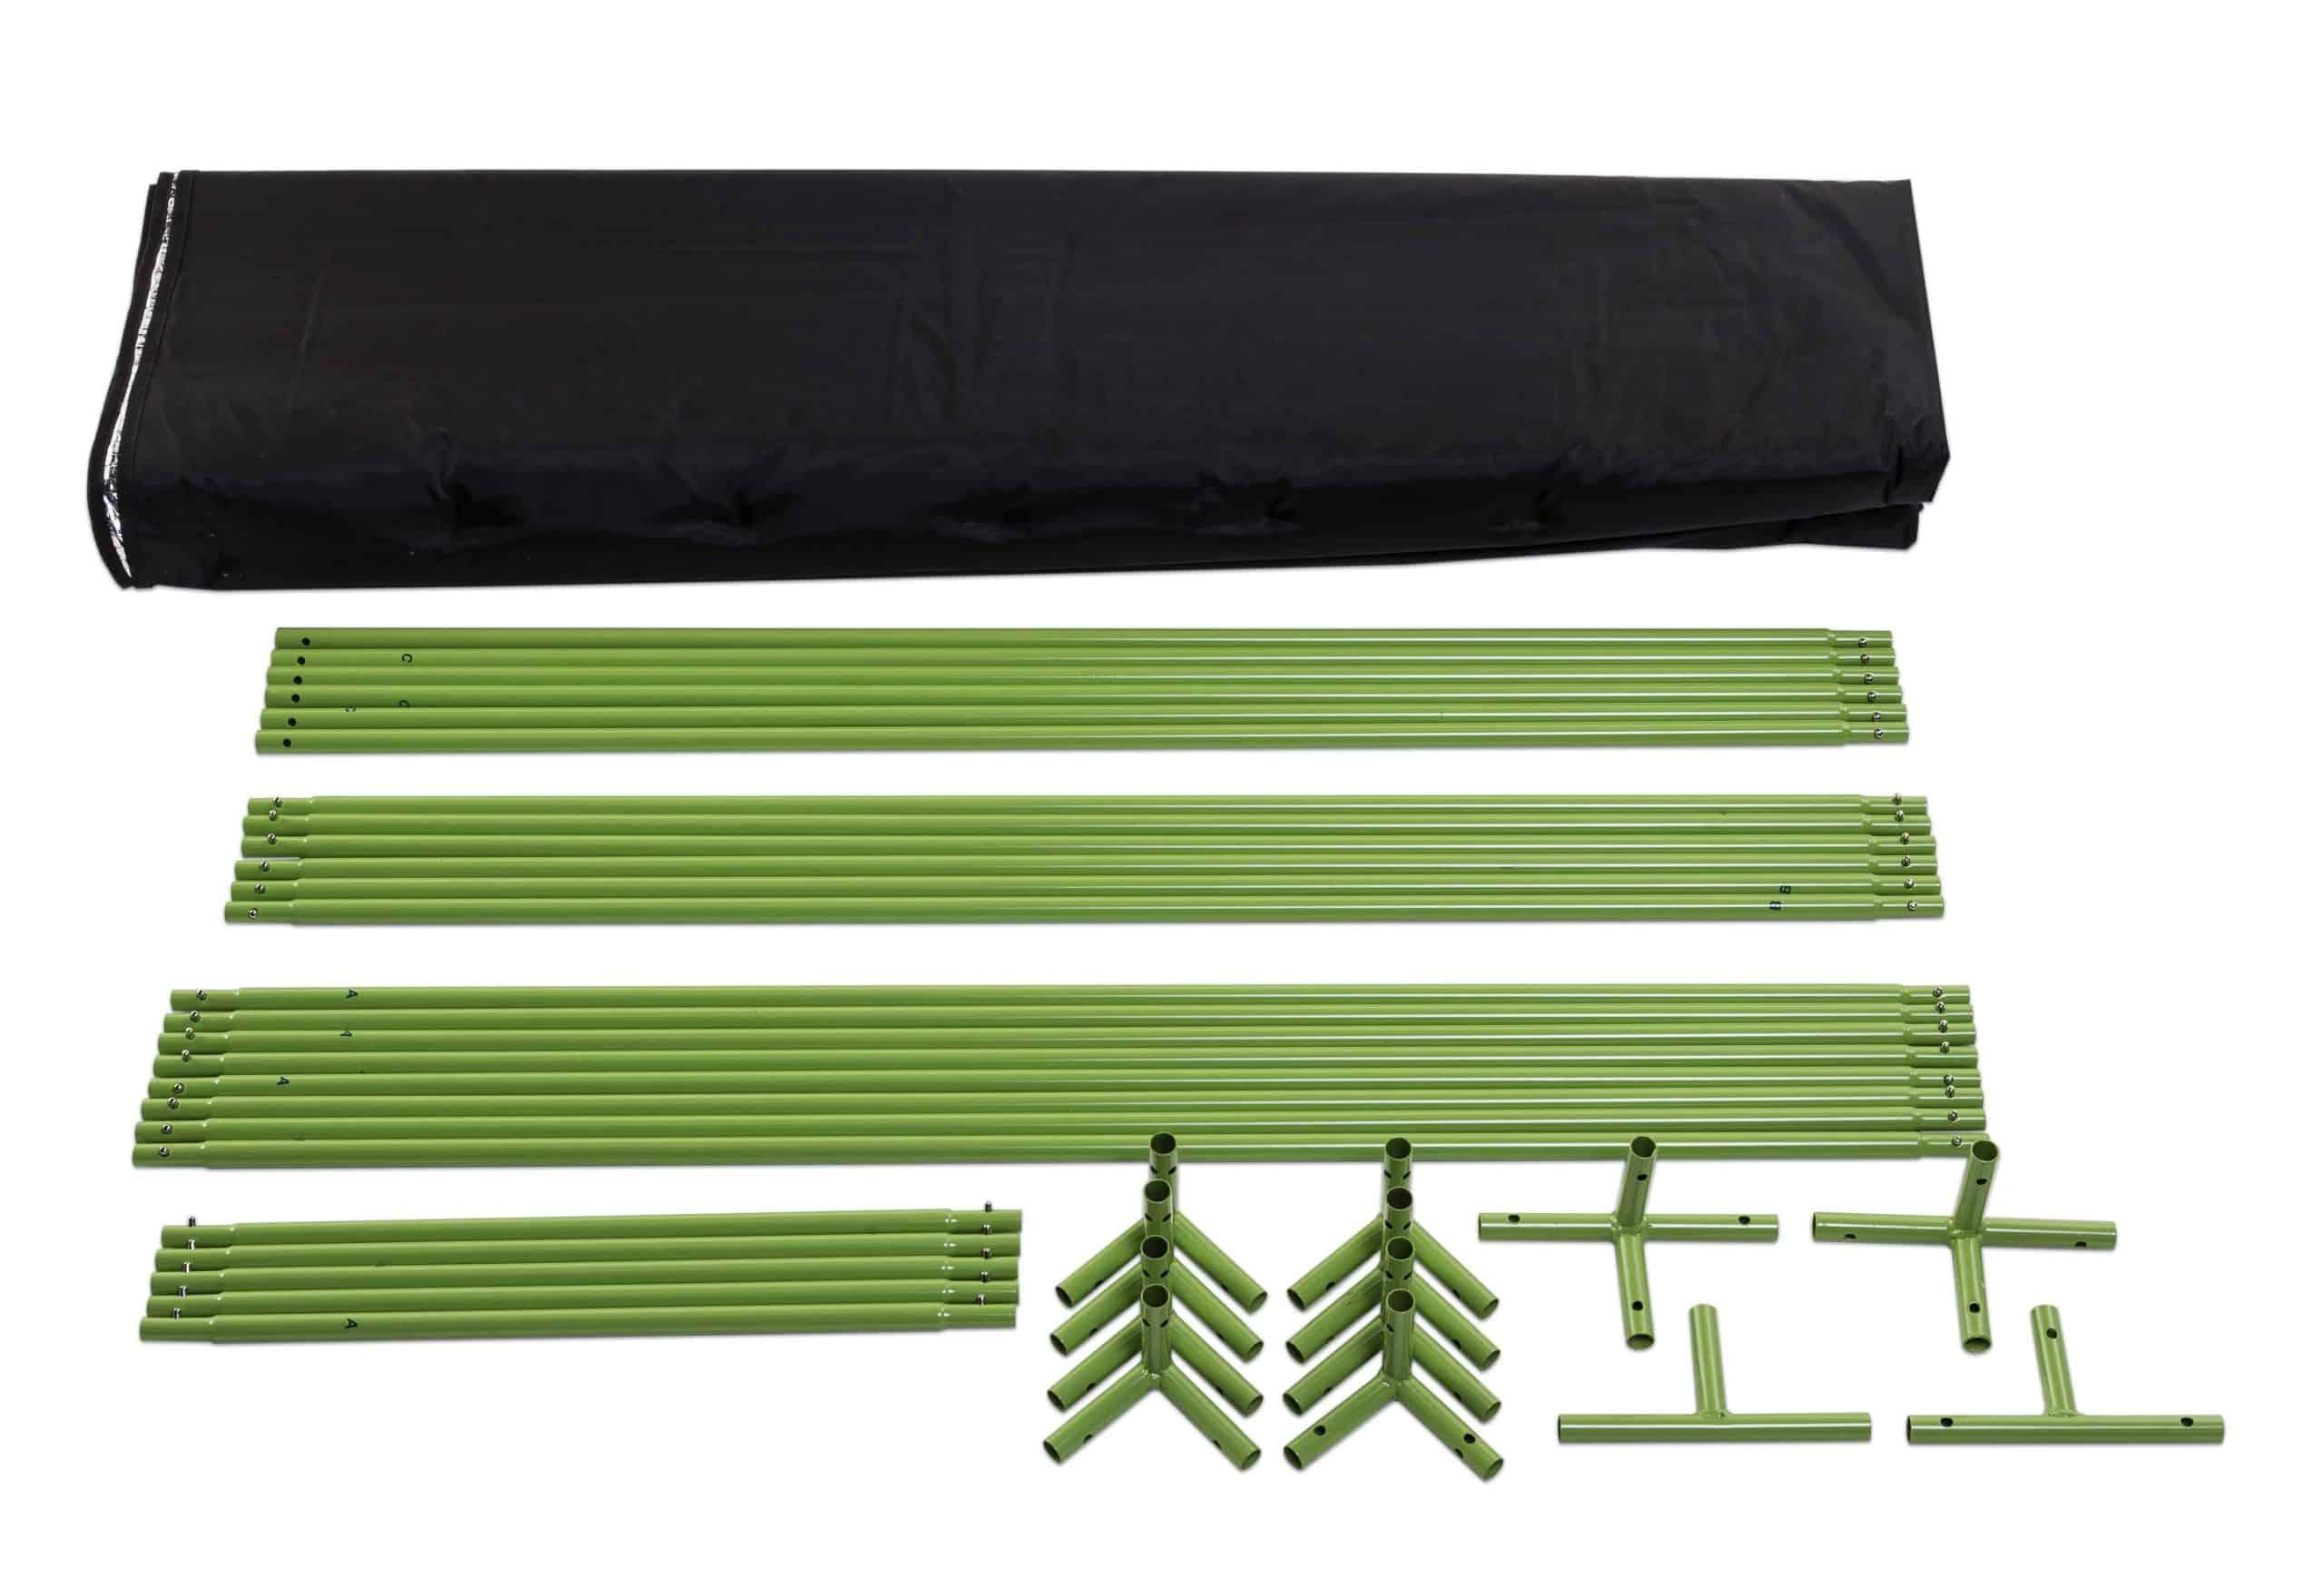 X Qube from Green Qube kit